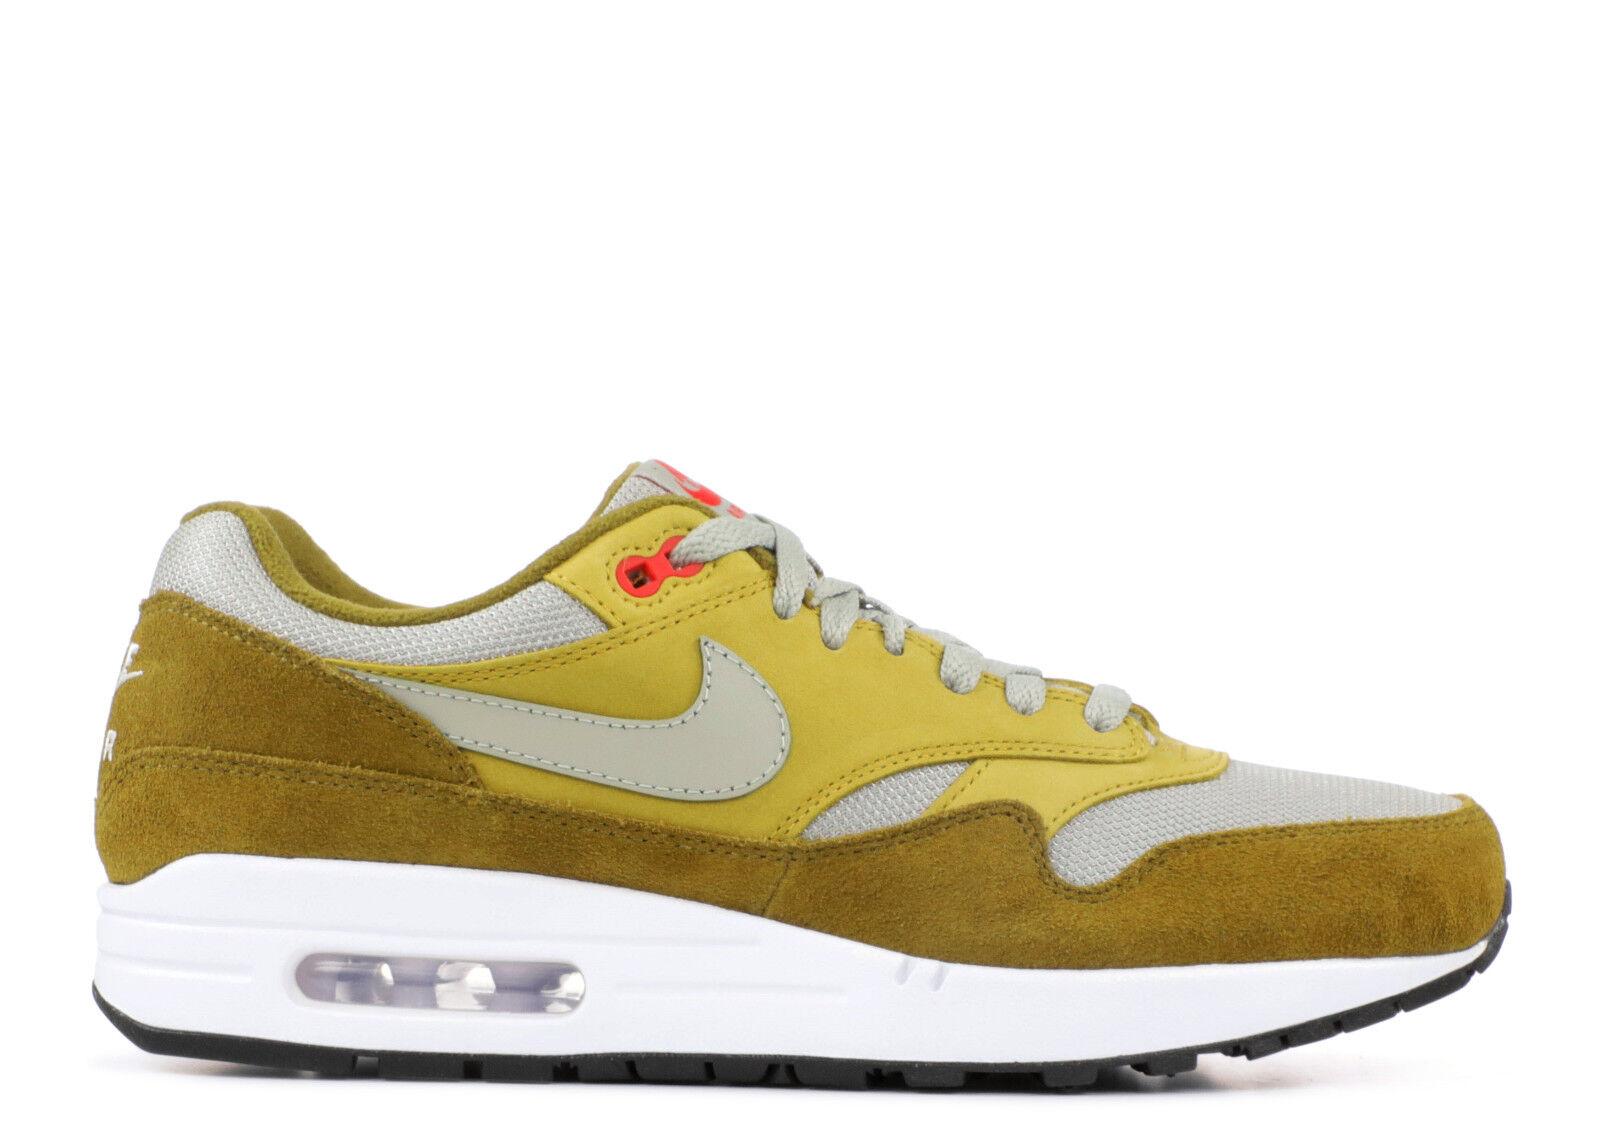 SALE Nike Air Max 1 Green Curry Atmos 6-13 Olive Flak Spruce Fog 908366-300 Casual wild